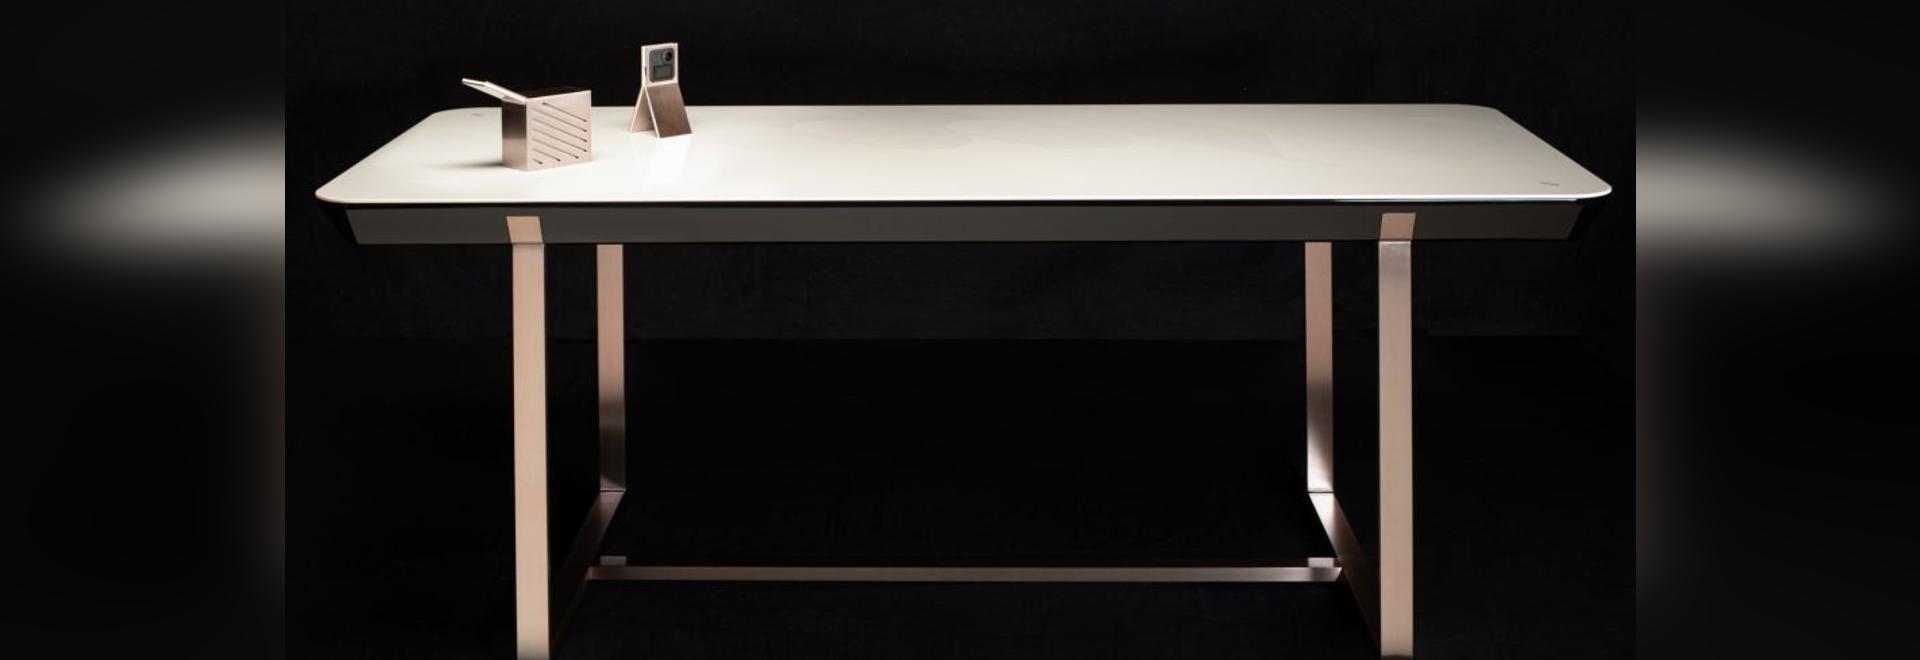 Il Versâtis - Eurokera Smart Table di Jean-Marc Gady